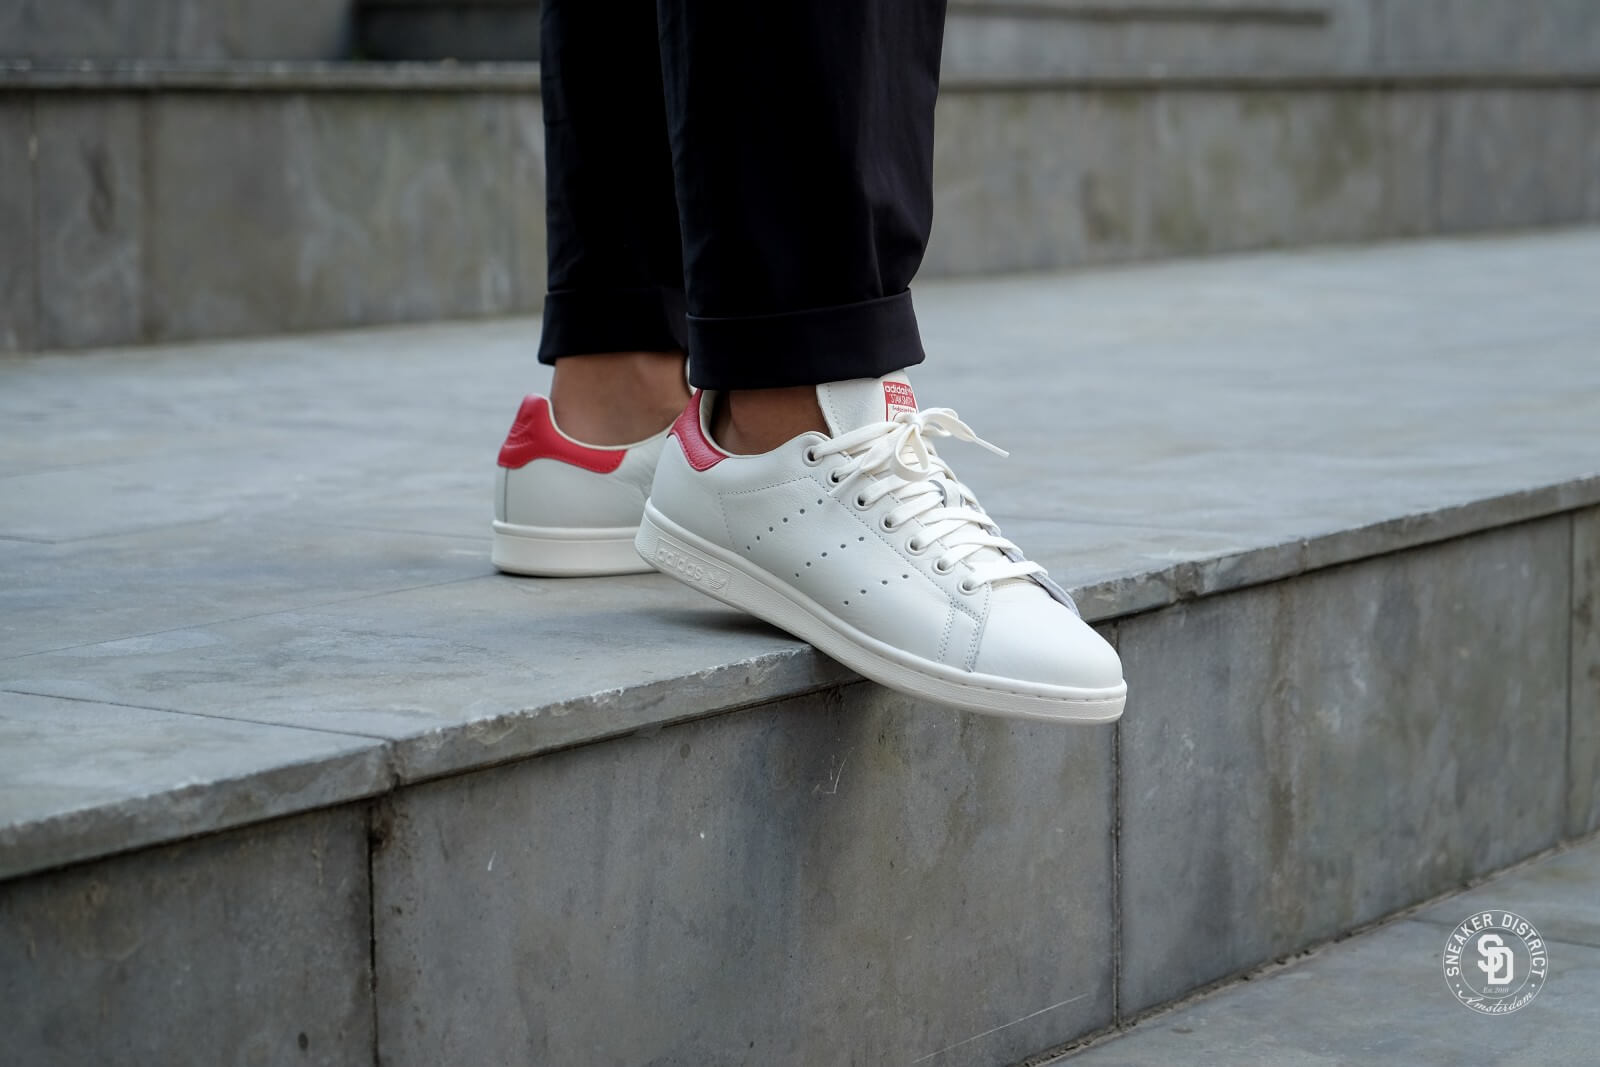 Adidas Stan Smith Chalk WhiteScarlet B37898